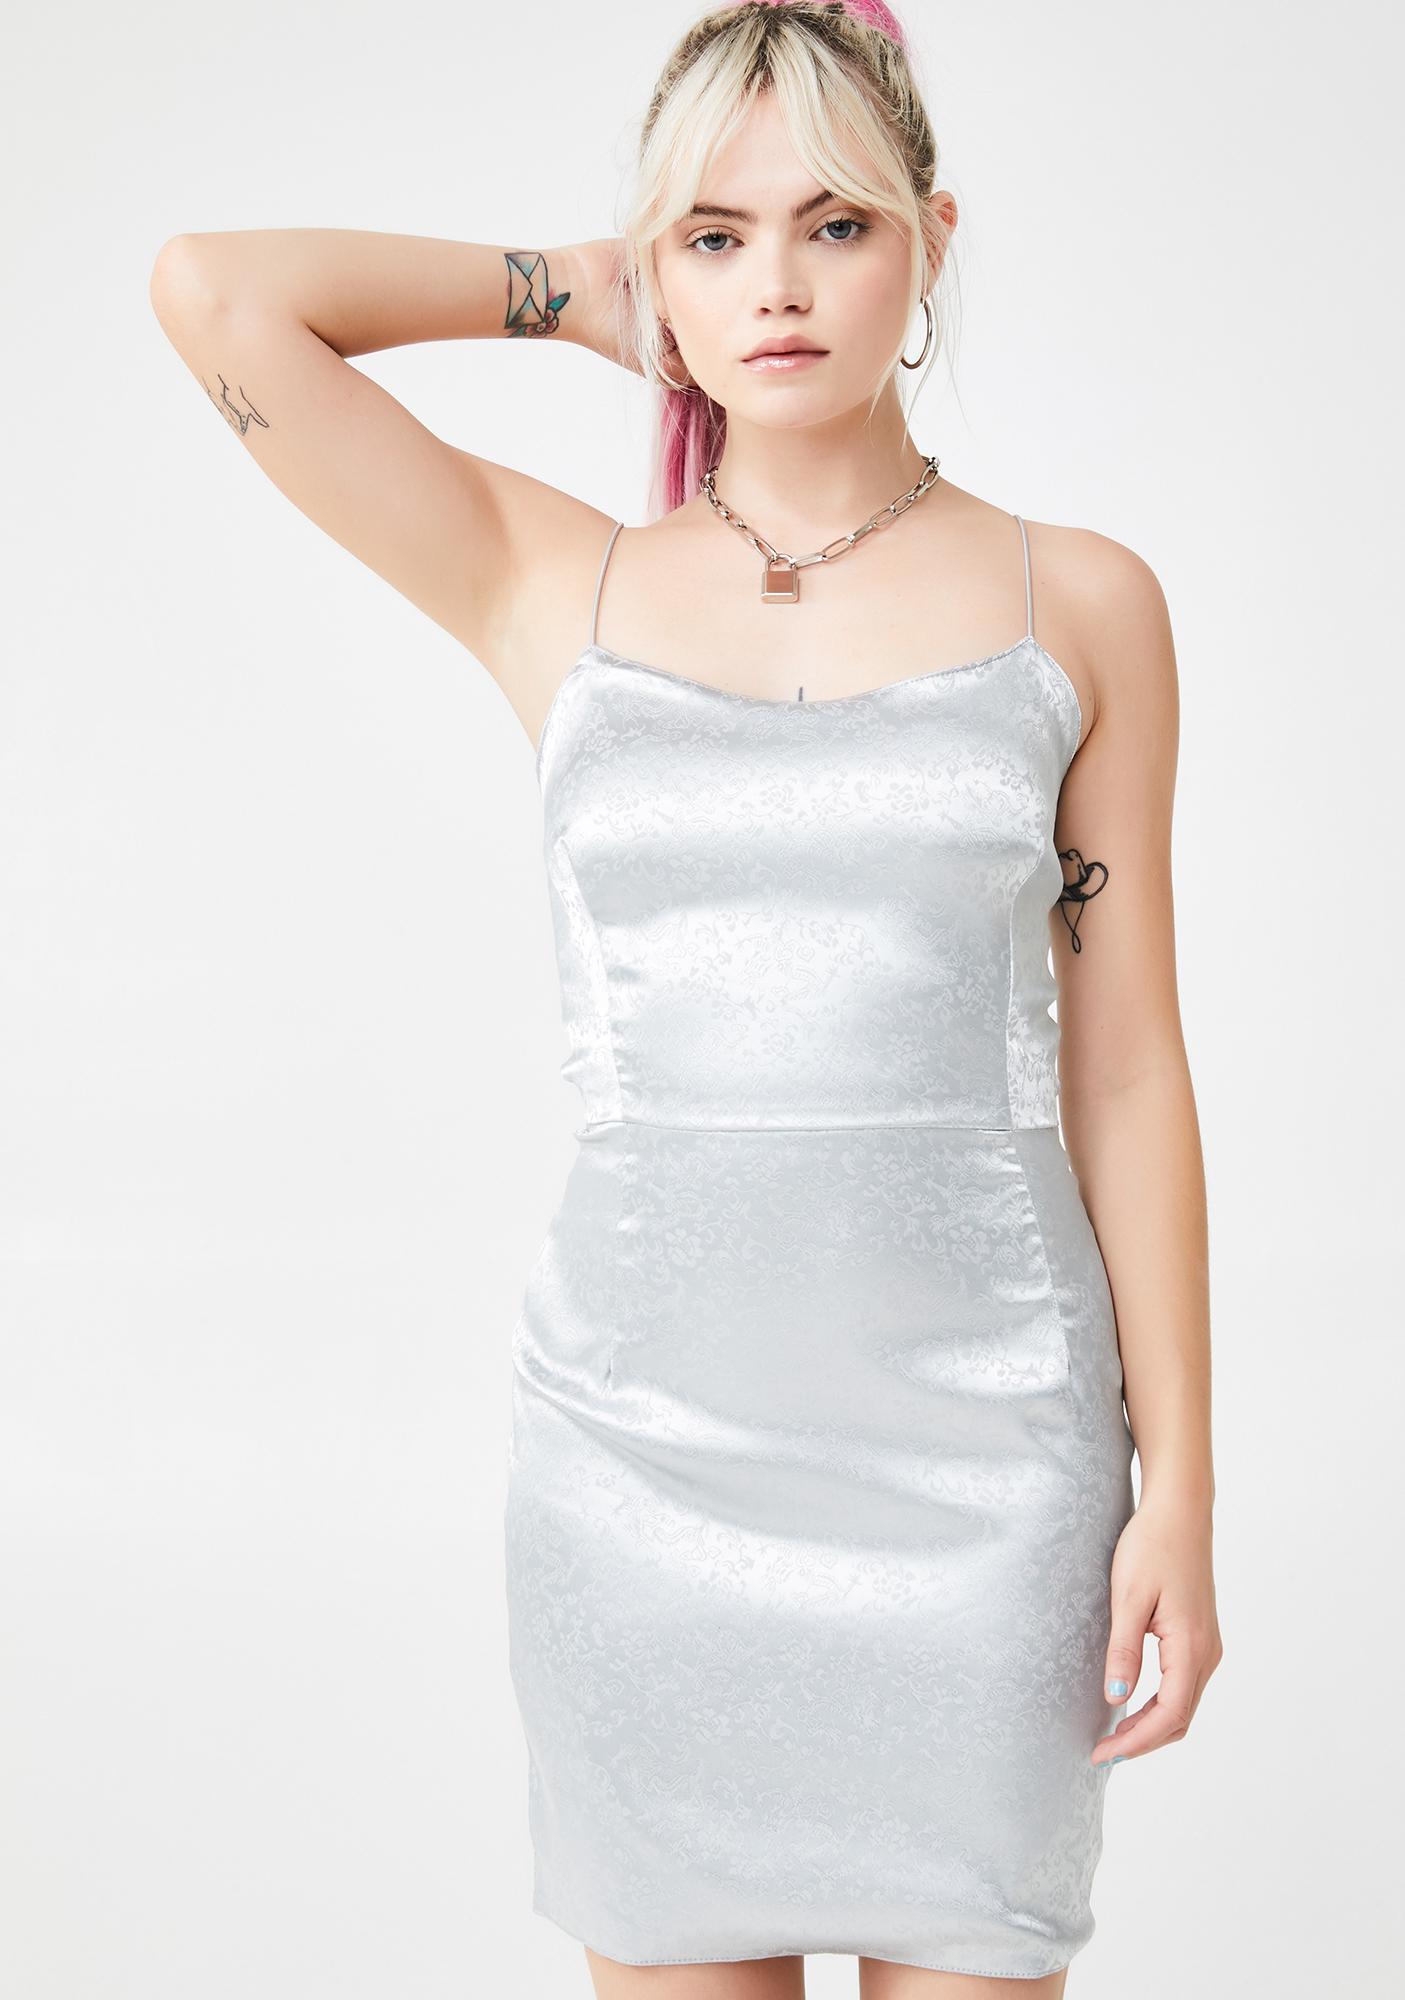 My Mum Made It Satin Strap Slip Dress